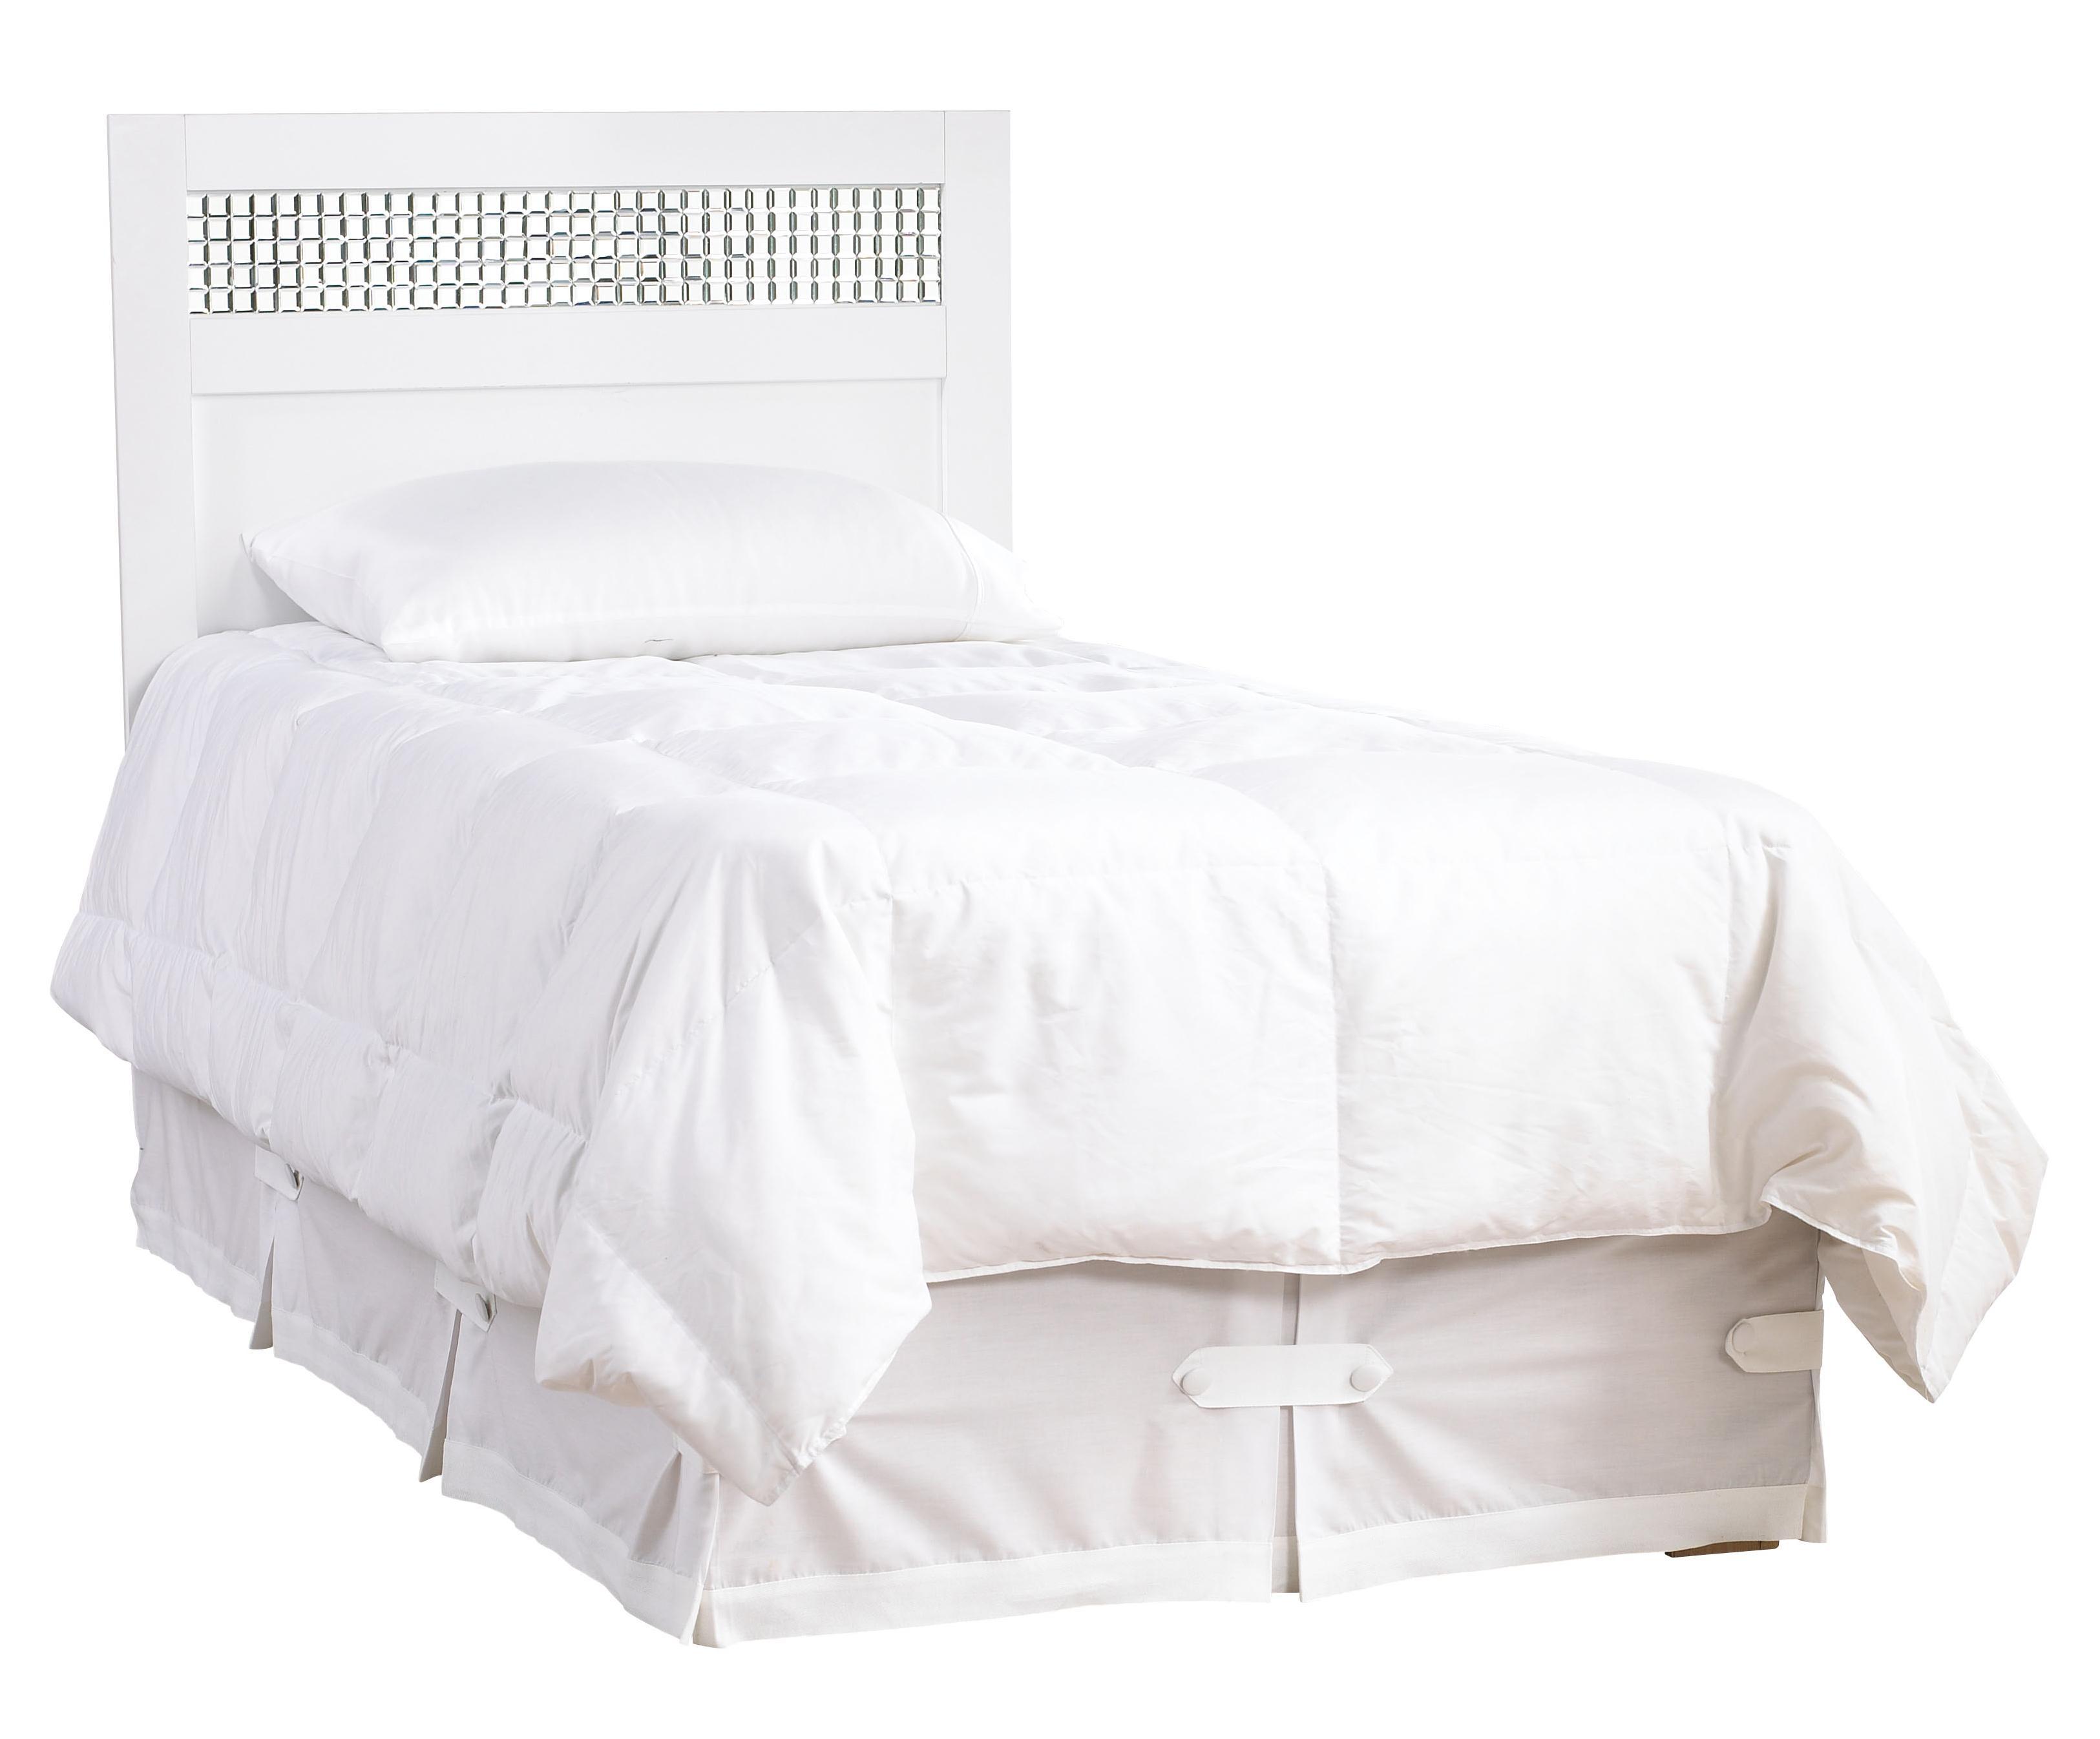 Standard Furniture Marilyn Youth Full Headboard - Item Number: 66301